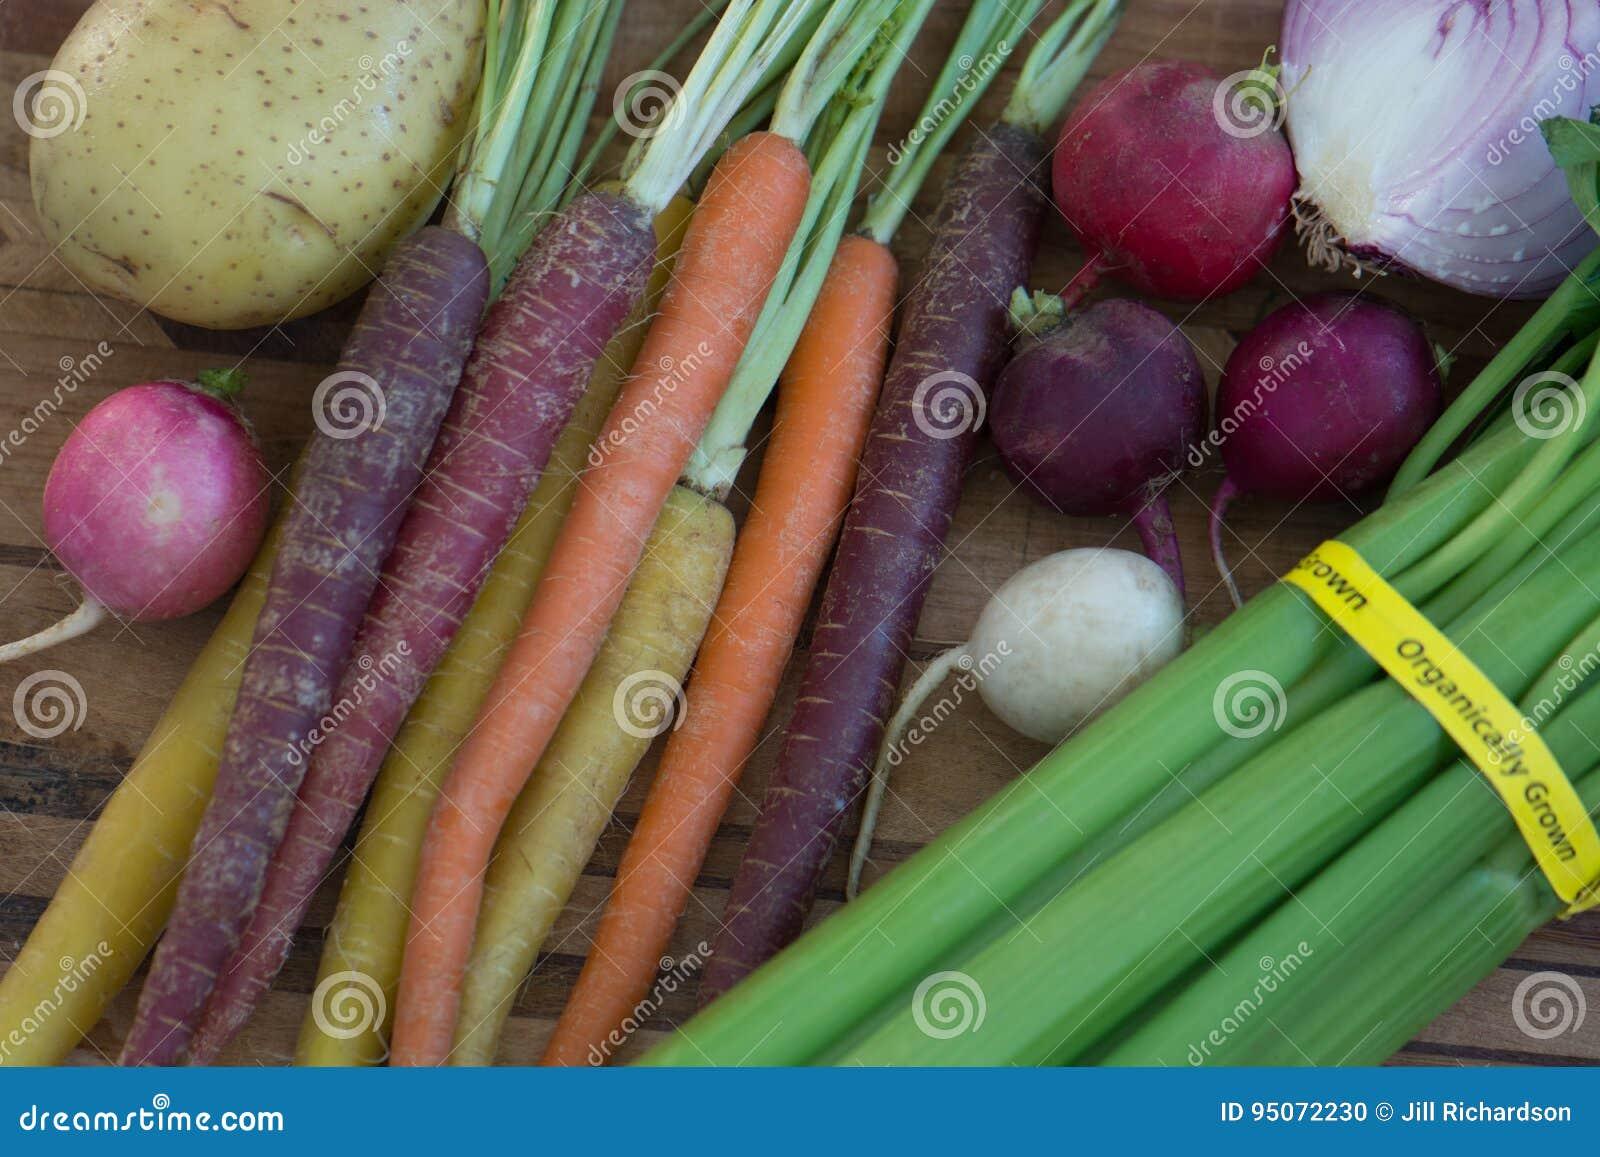 Multi Colored Organic Carrots With Potato Onion Celery